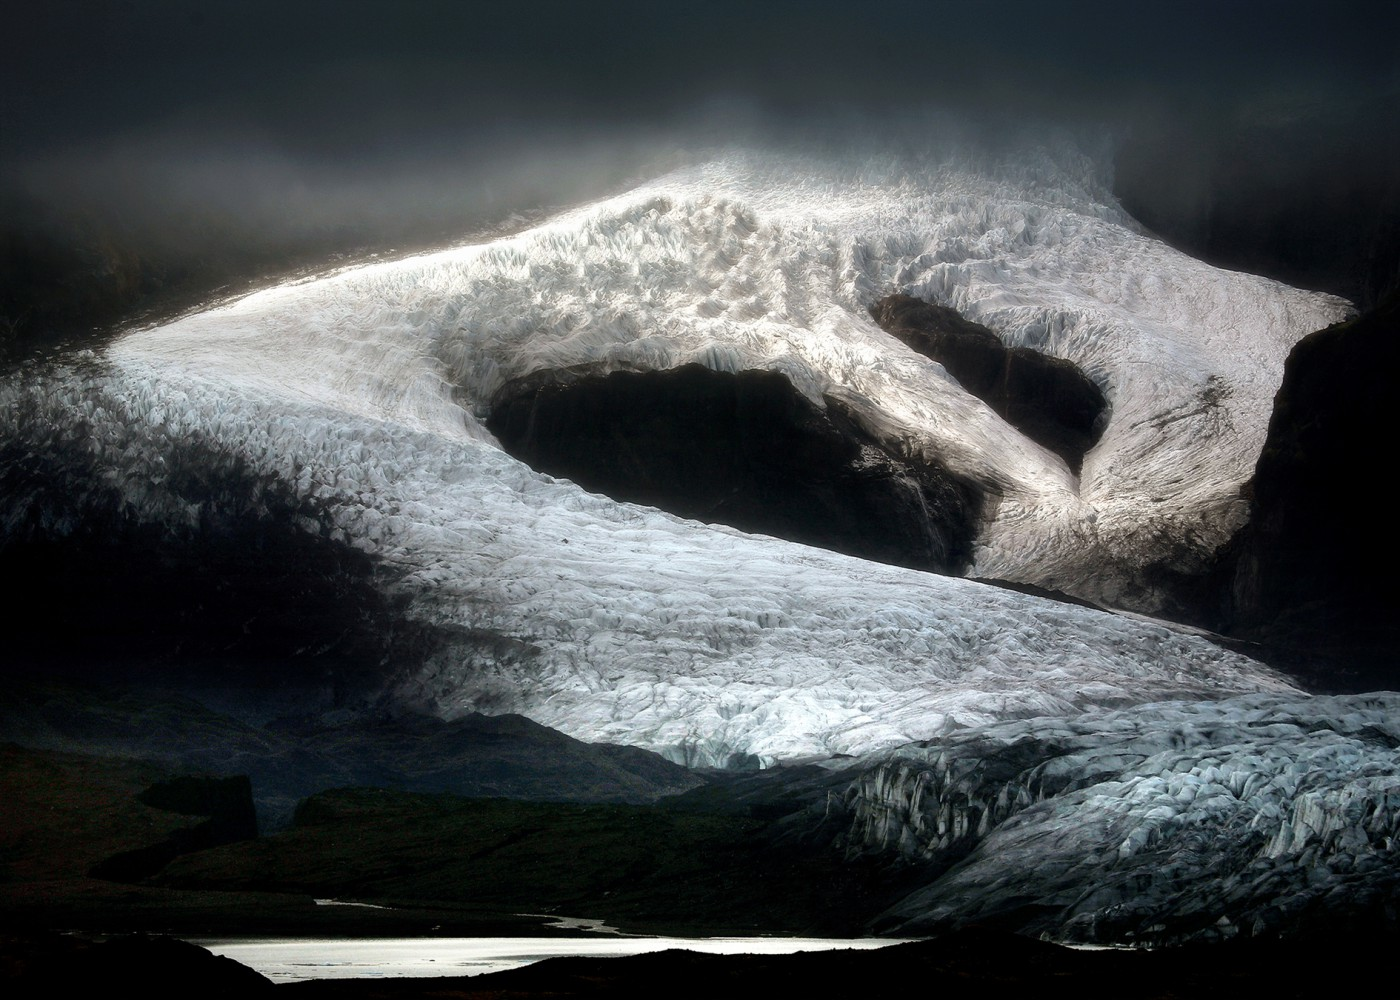 Jiri Vondrak, </span><span><em>FJALLSJOKULL GLACIER - ICELAND, 2008</em>, </span><span>Digital Photography